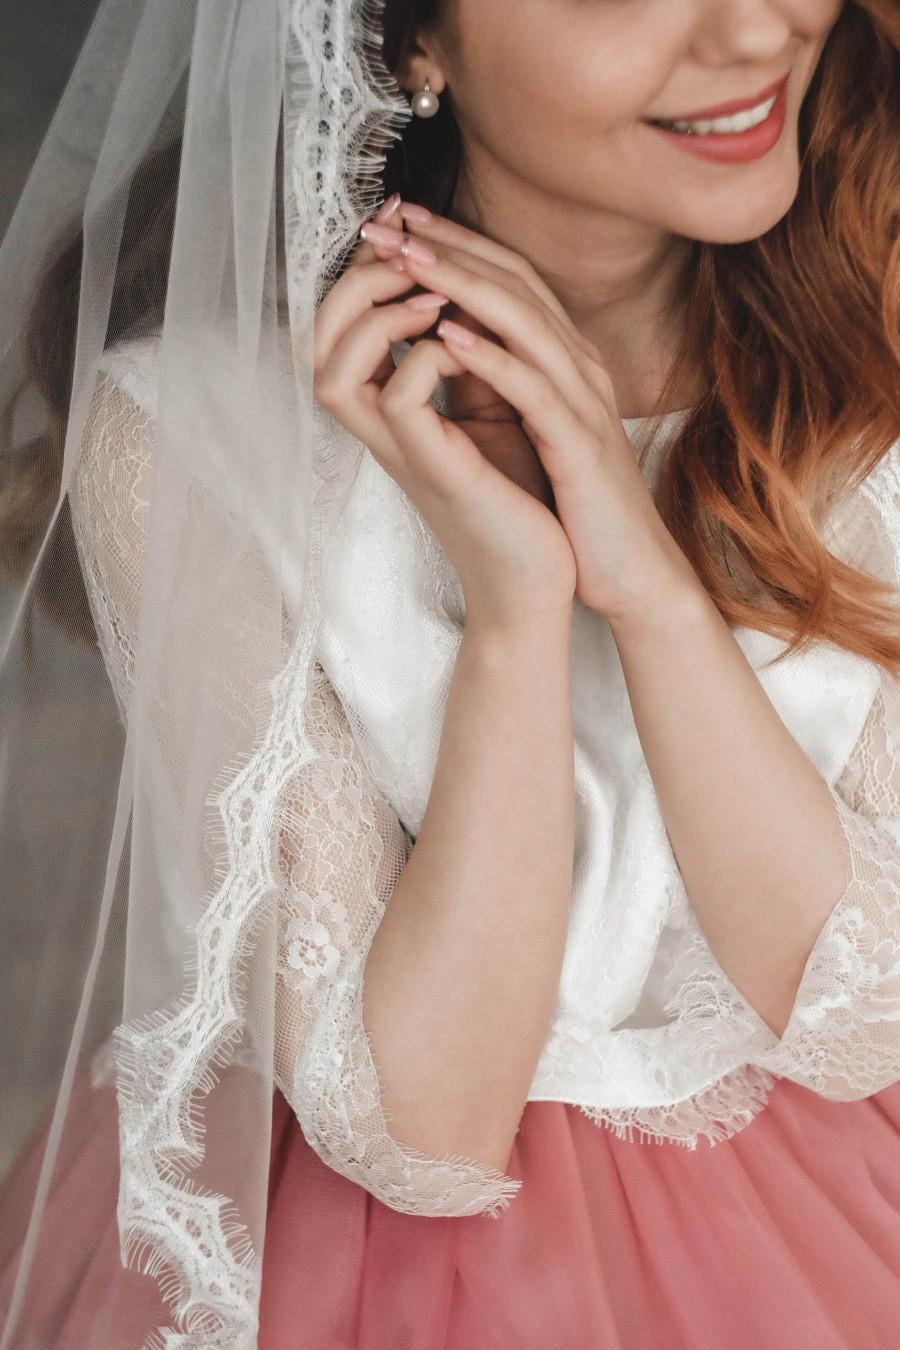 Mariage - Lace eyelash veil, Wedding veil, Bridal veil, Lace veil, Veil wedding, Veil with lace